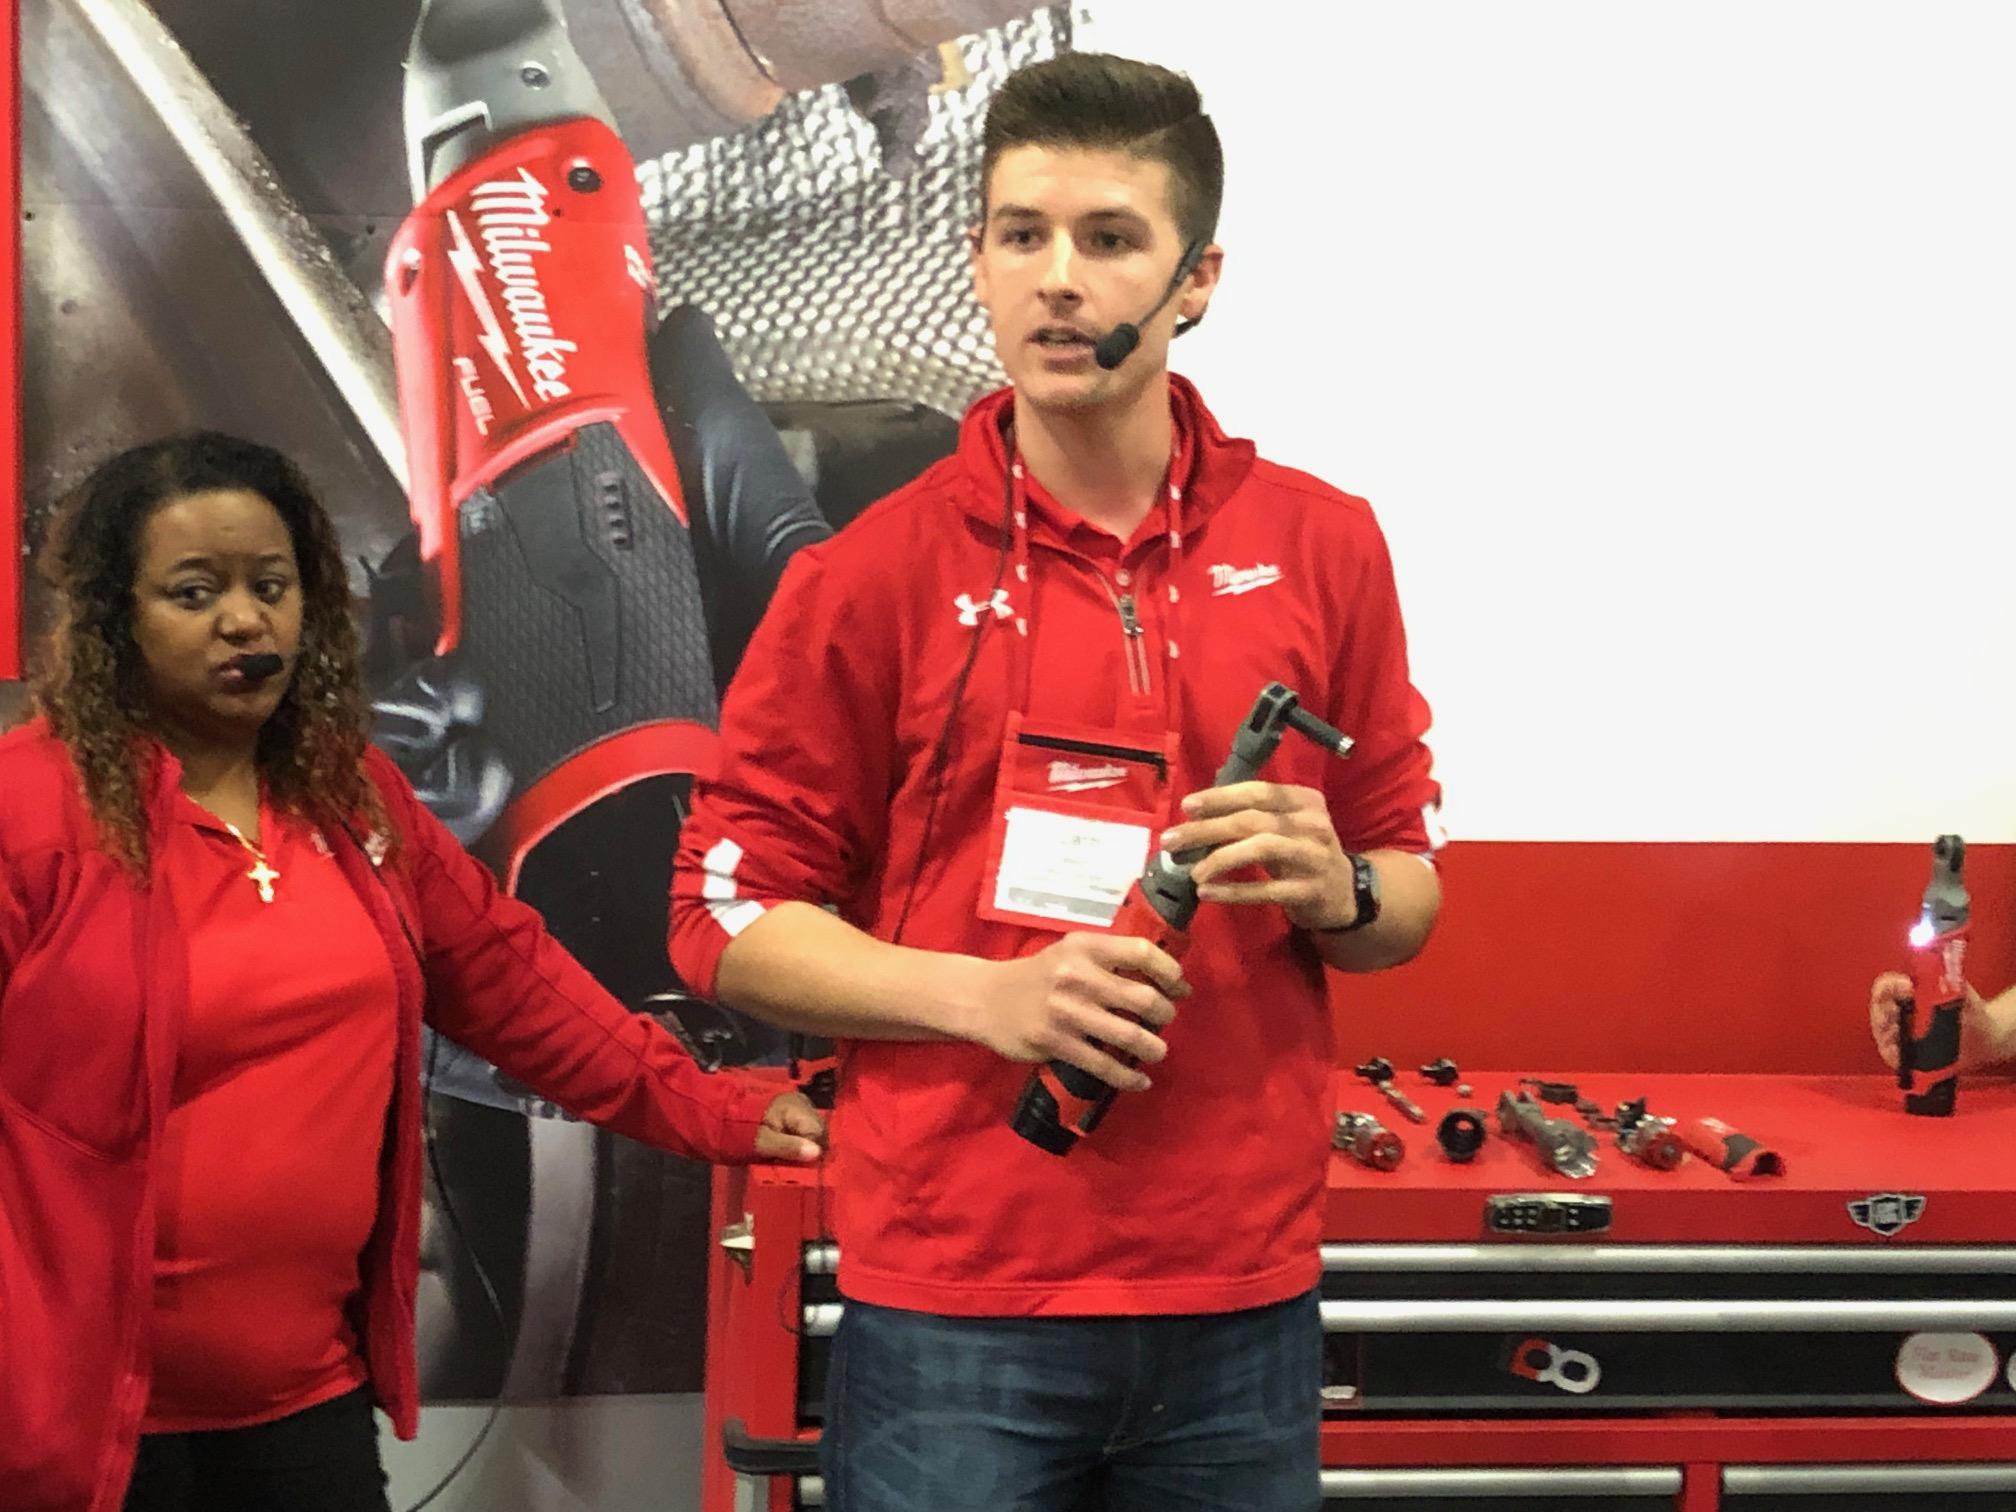 Milwaukee Tool Moves into New Markets